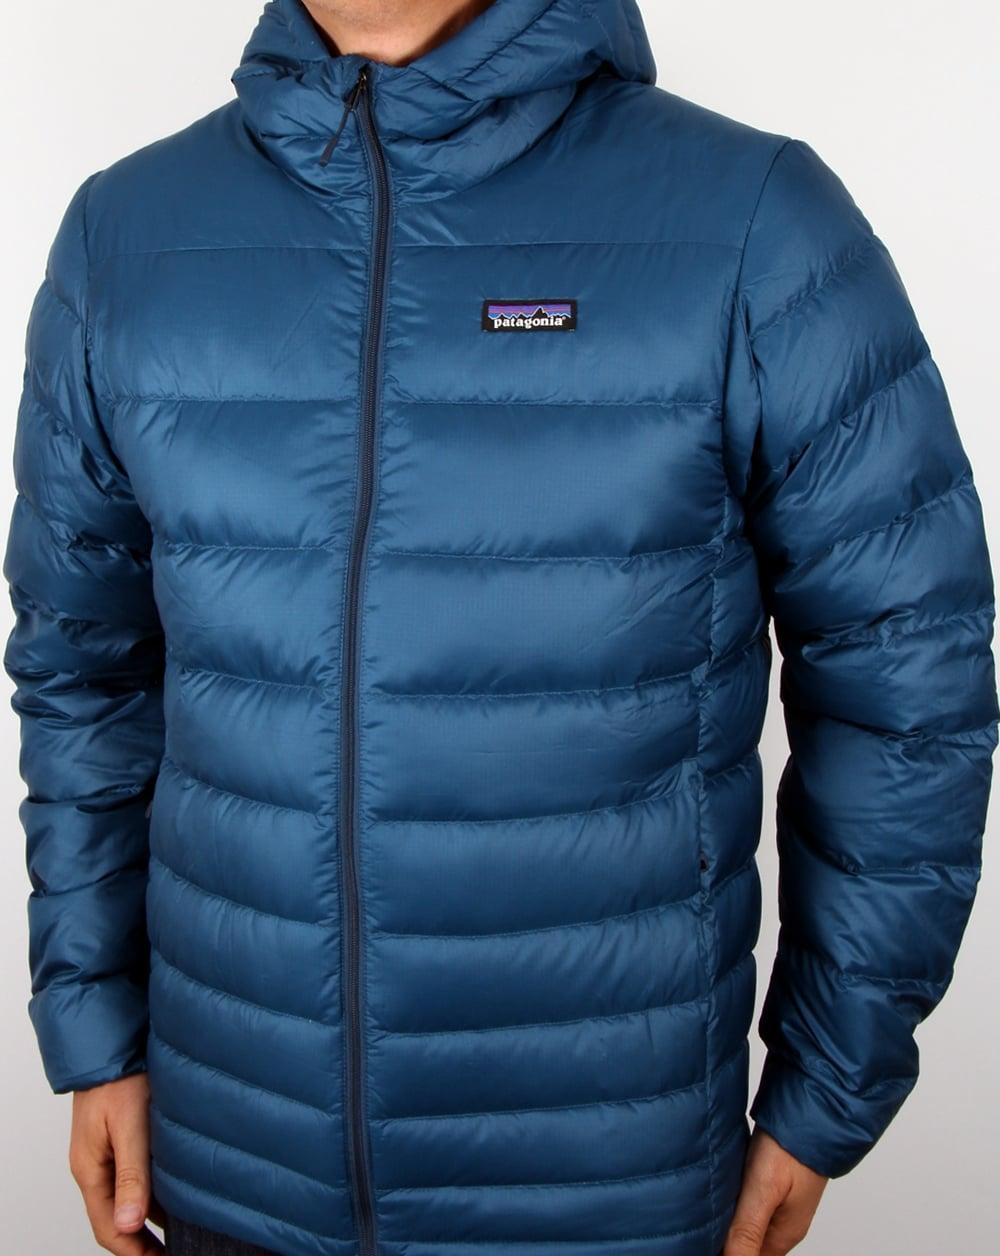 Patagonia Hi Loft Down Hooded Jacket Glass Blue Jackets